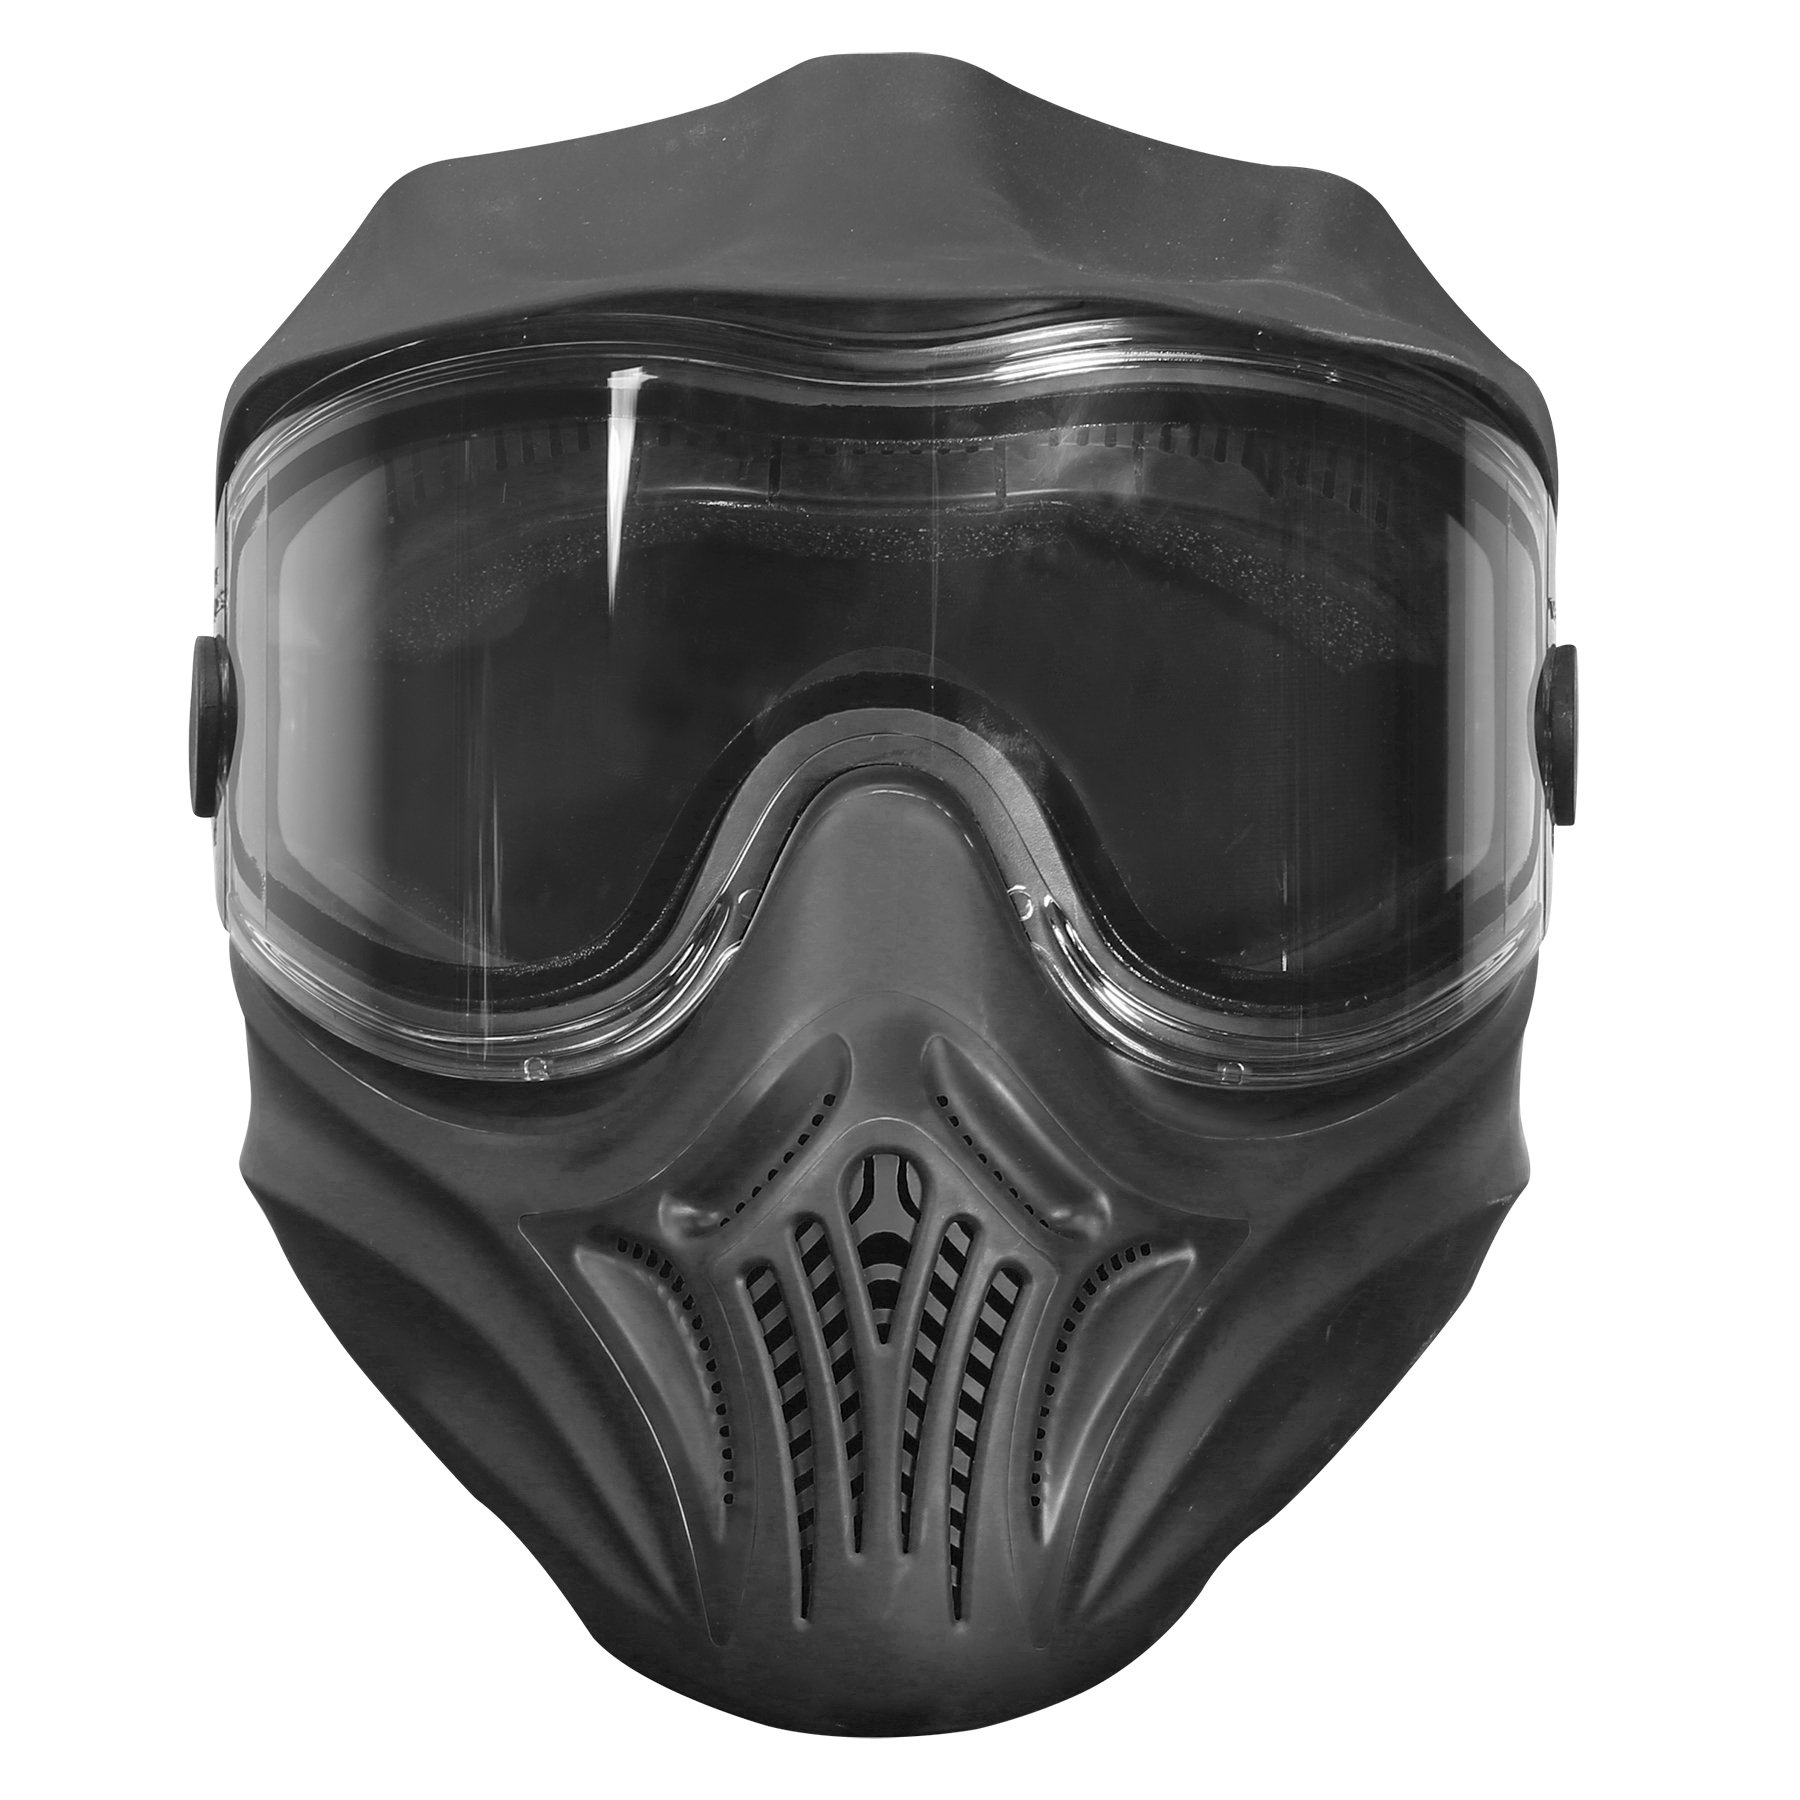 Empire Helix Paintball Mask With Thermal Lens Black Walmart Com Walmart Com